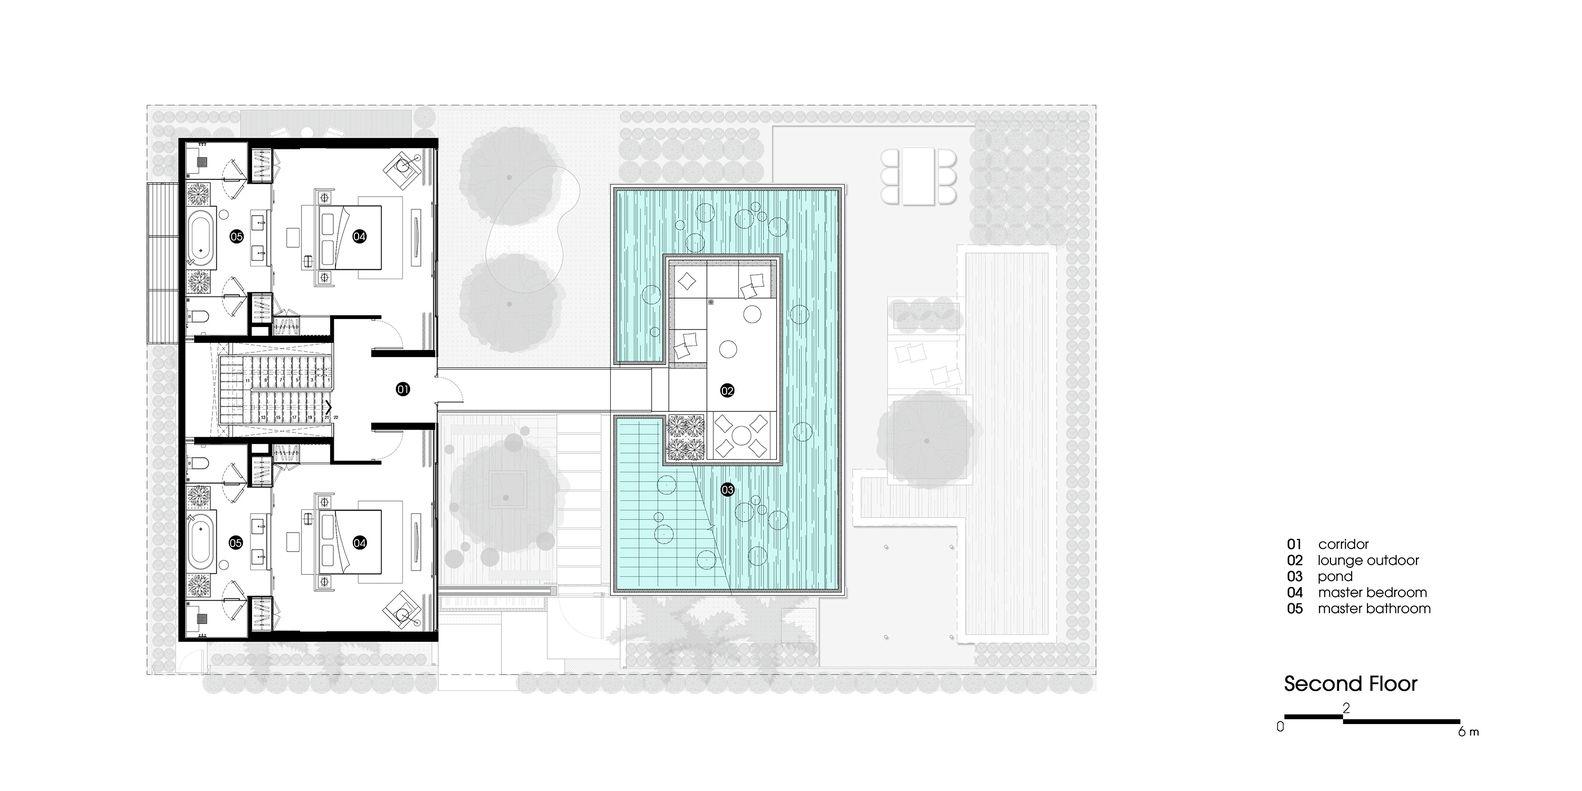 Gallery of naman residences villa b mia design studio 15 gallery of naman residences villa b mia design studio 15 malvernweather Images